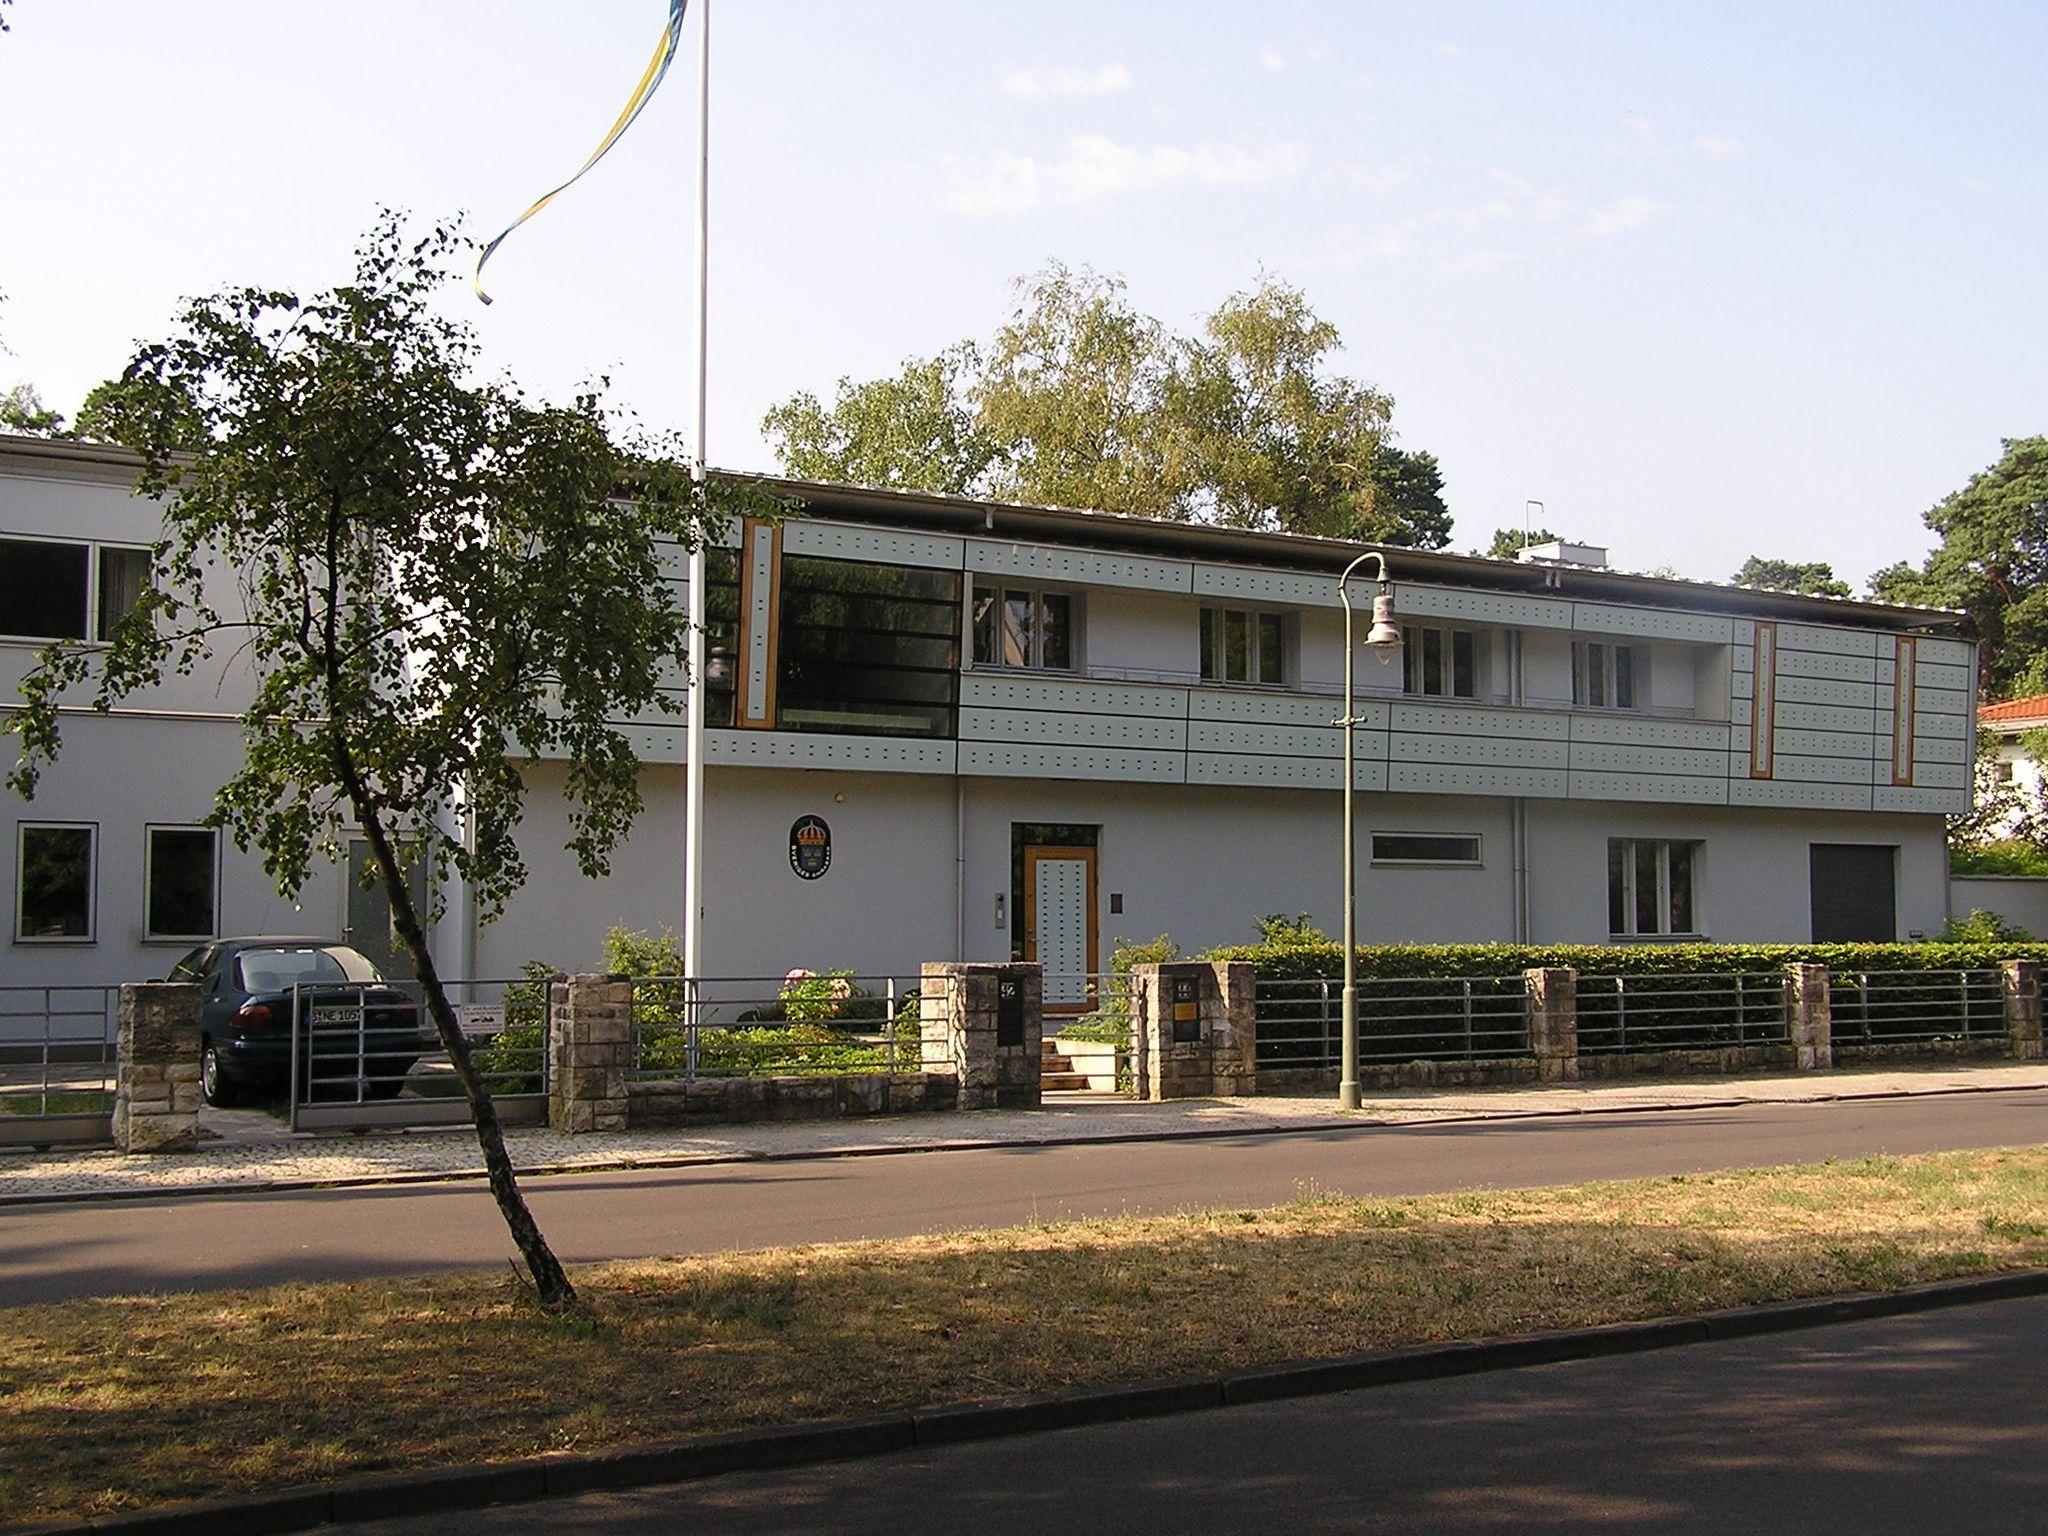 Residenz des schwedischen Botschafters in Berlin, Pücklerstraße 42-44, Berlin-Grunewald - Urheber: Axel Mauruszat